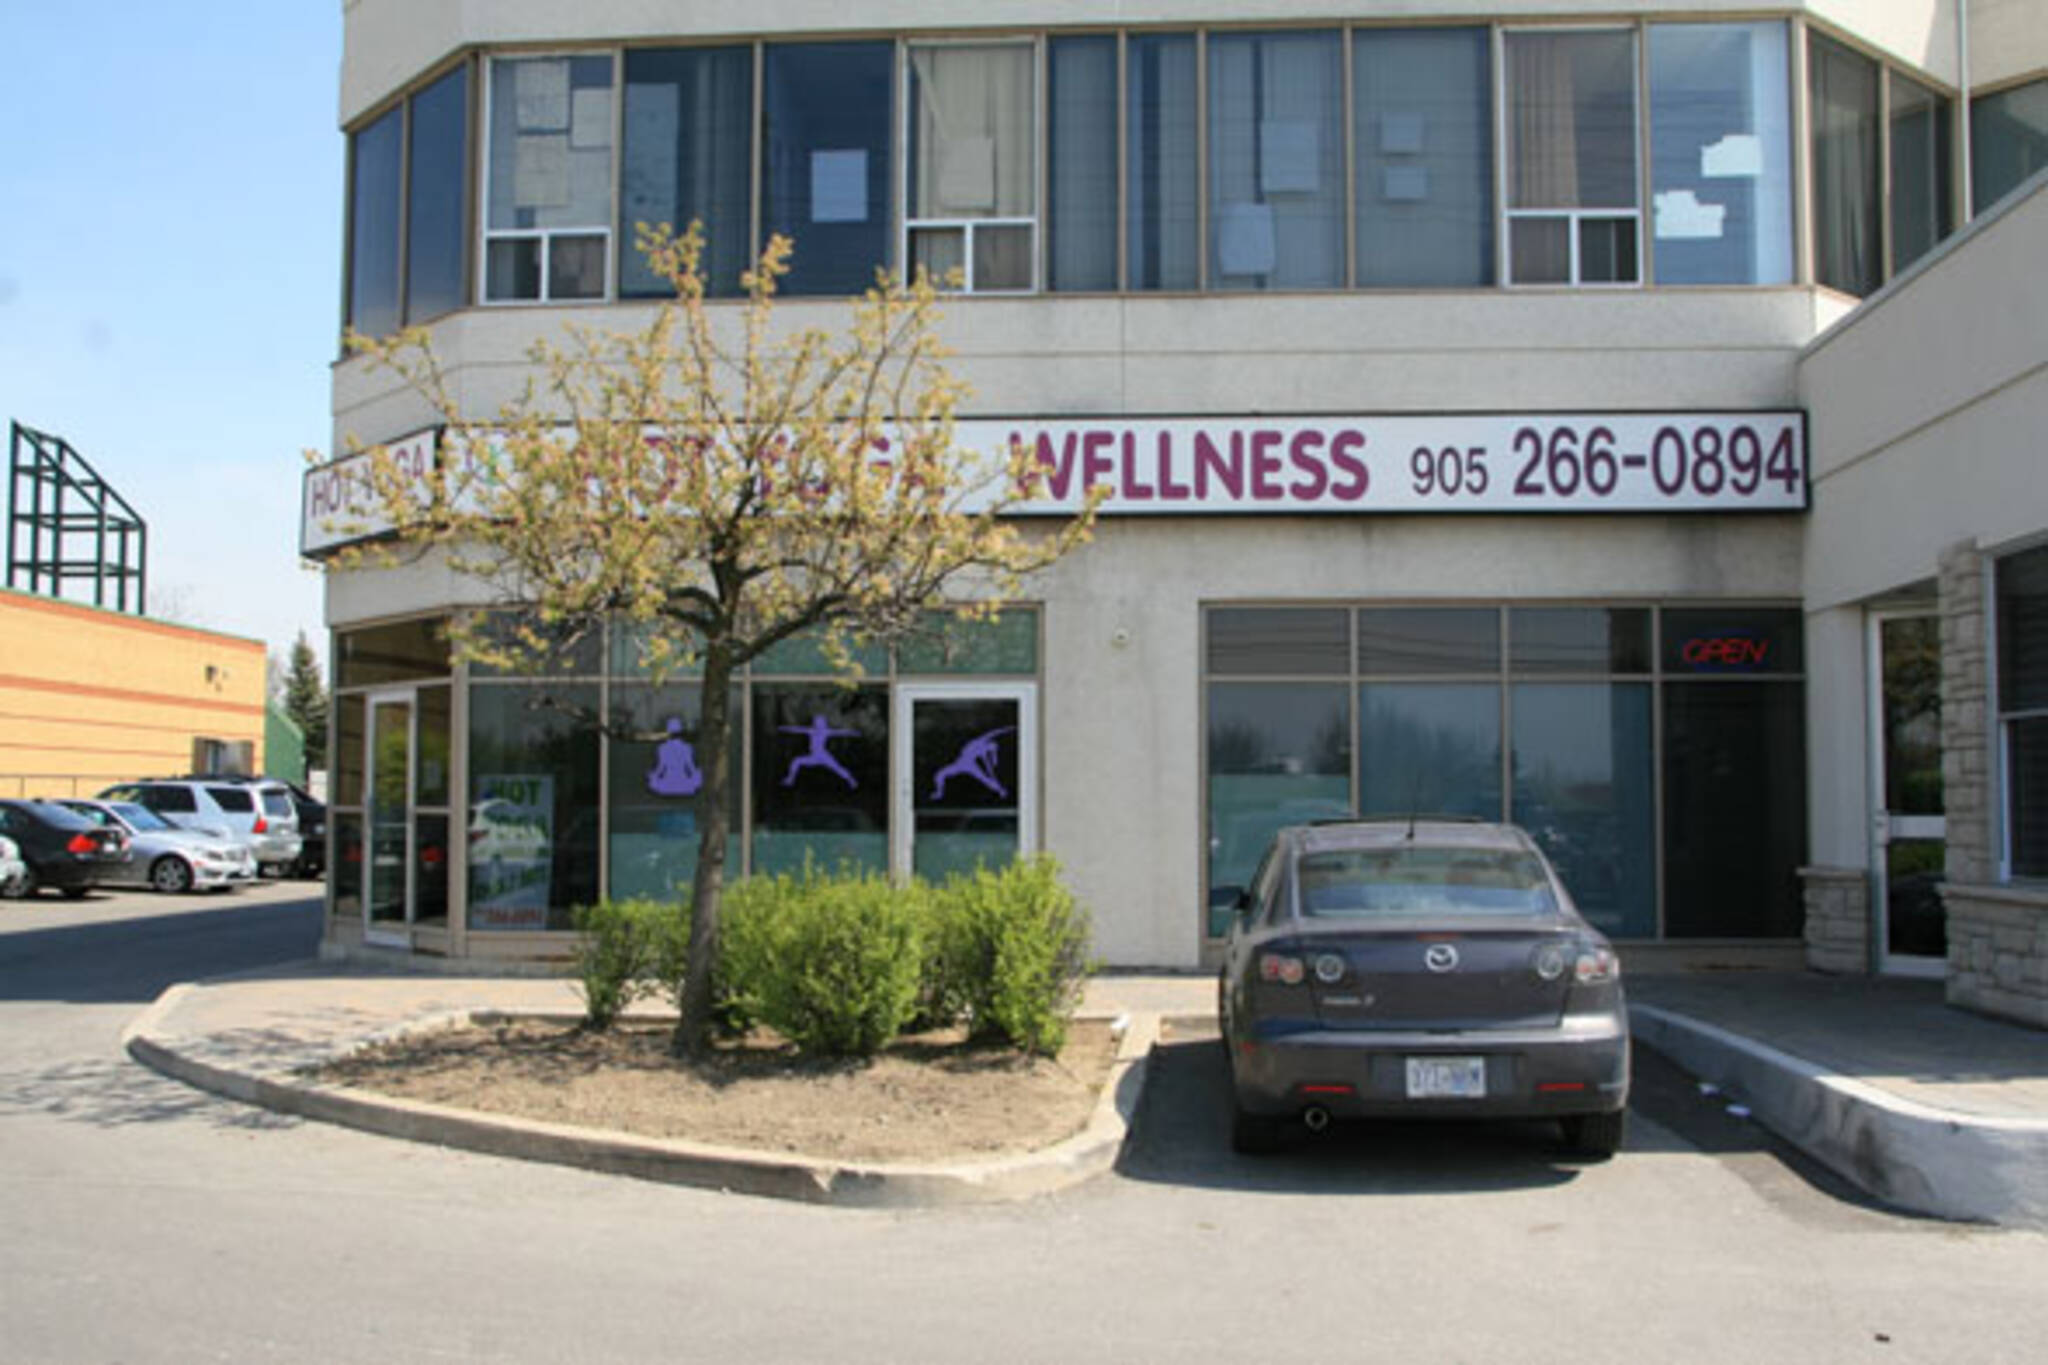 Toronto Hot Yoga Wellness